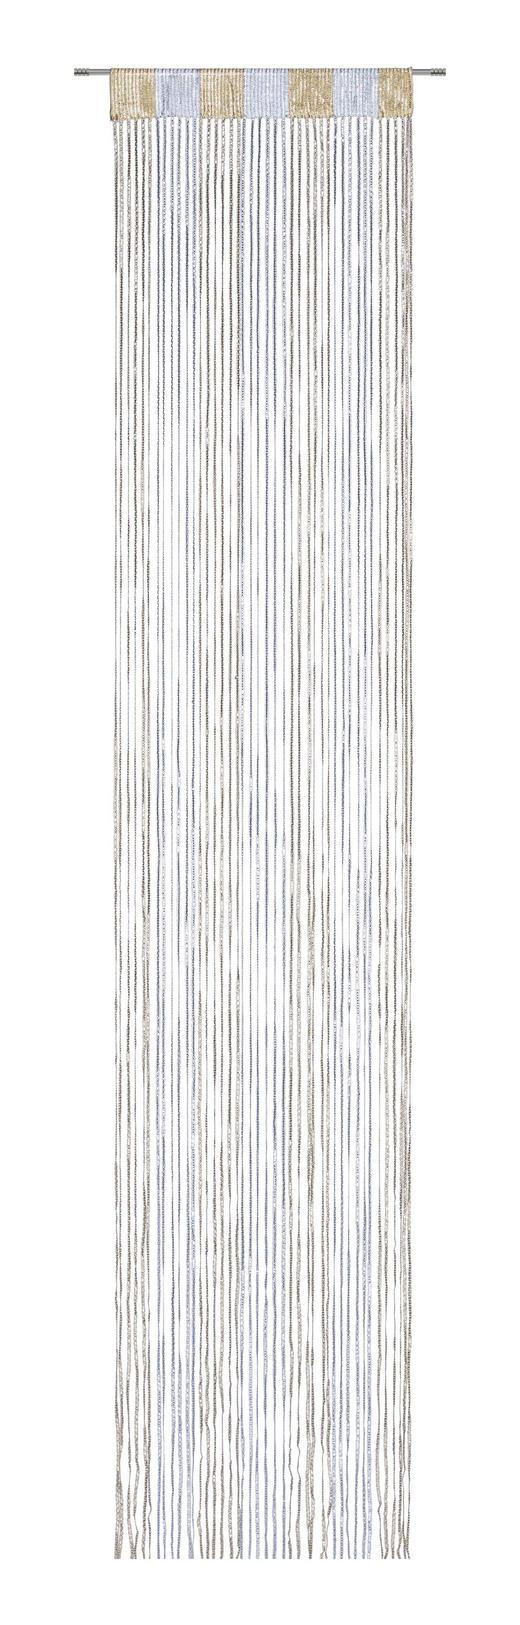 FADENSTORE  transparent  90/245 cm - Silberfarben/Goldfarben, Design, Textil (90/245cm) - Boxxx